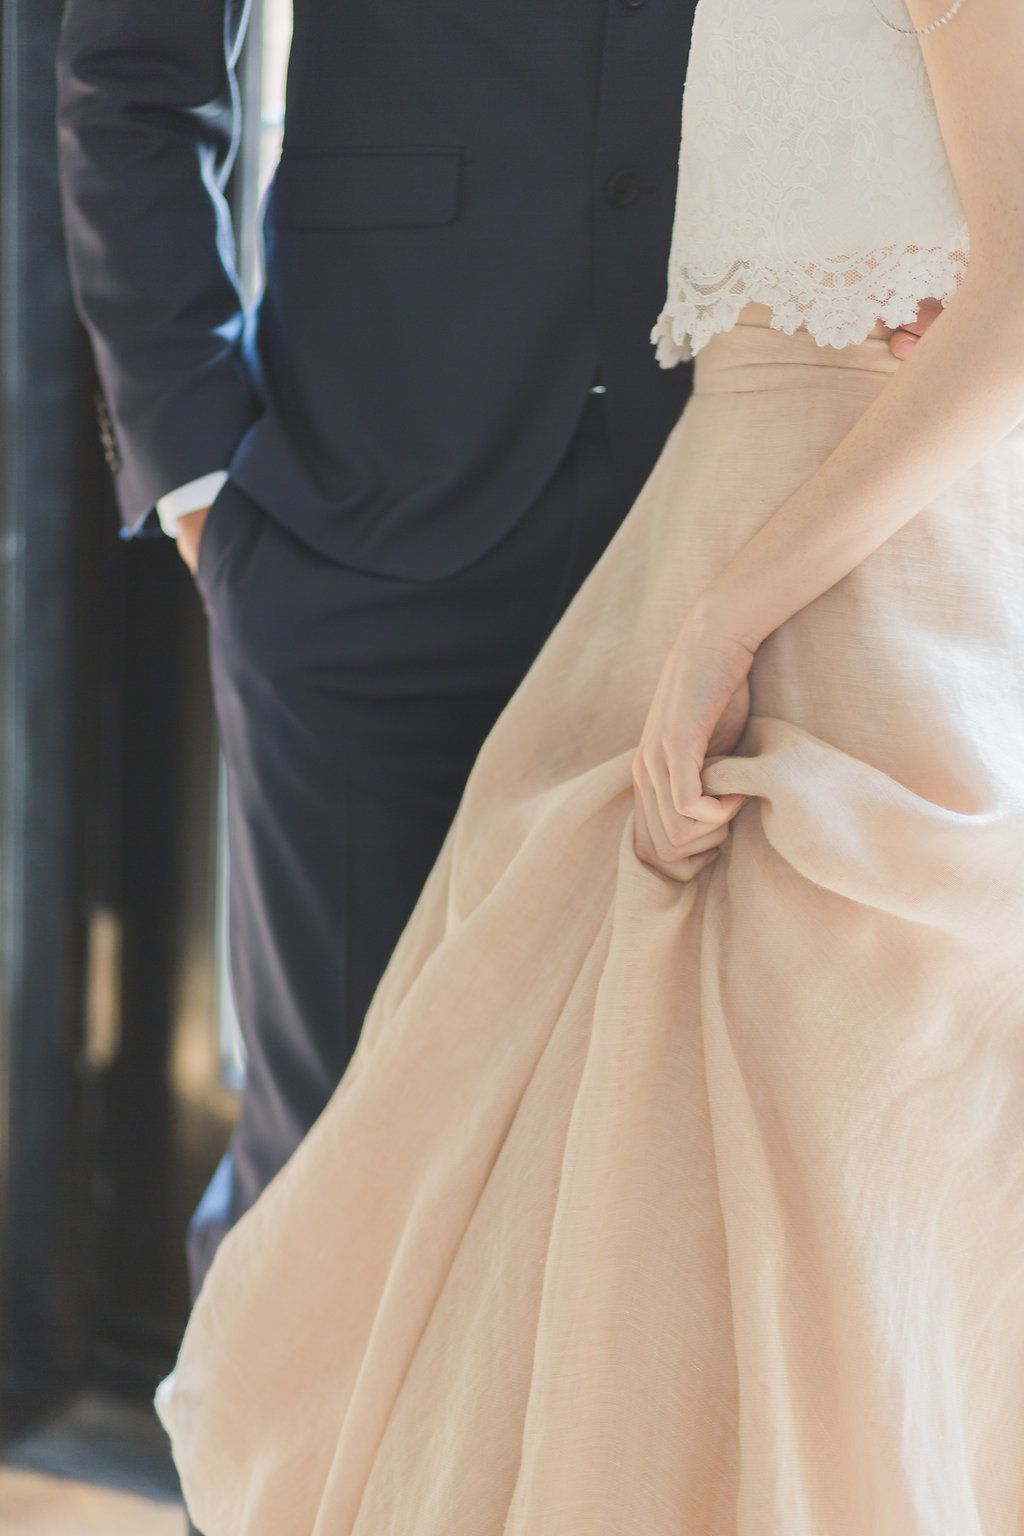 Phoebe Lo Events Toronto Wedding - Storys Building Urban Loft Paper Inspired Wedding 016.jpg